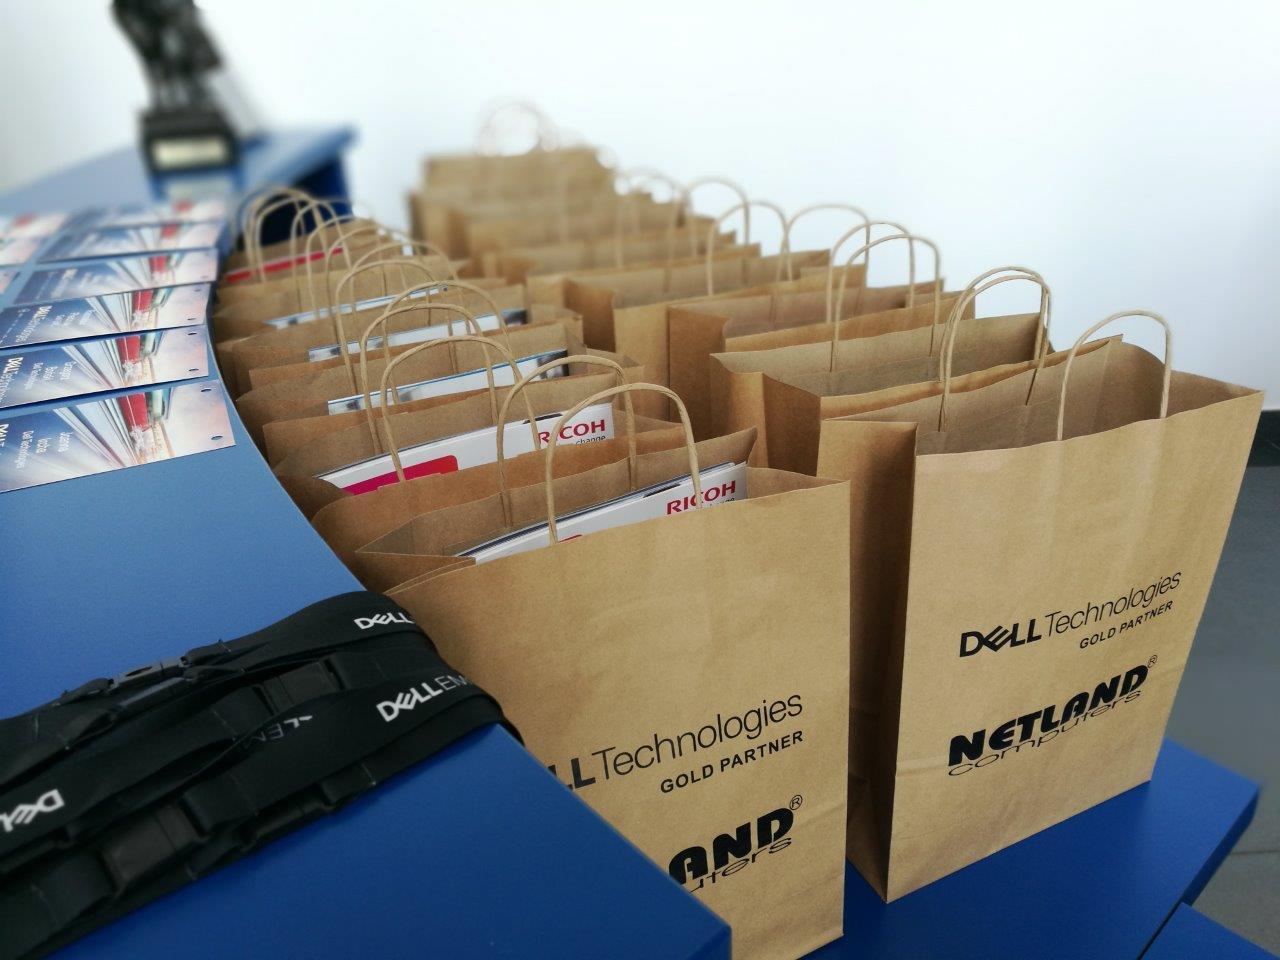 konferencja Dell i Netland w fabryce Dell w Łodzi